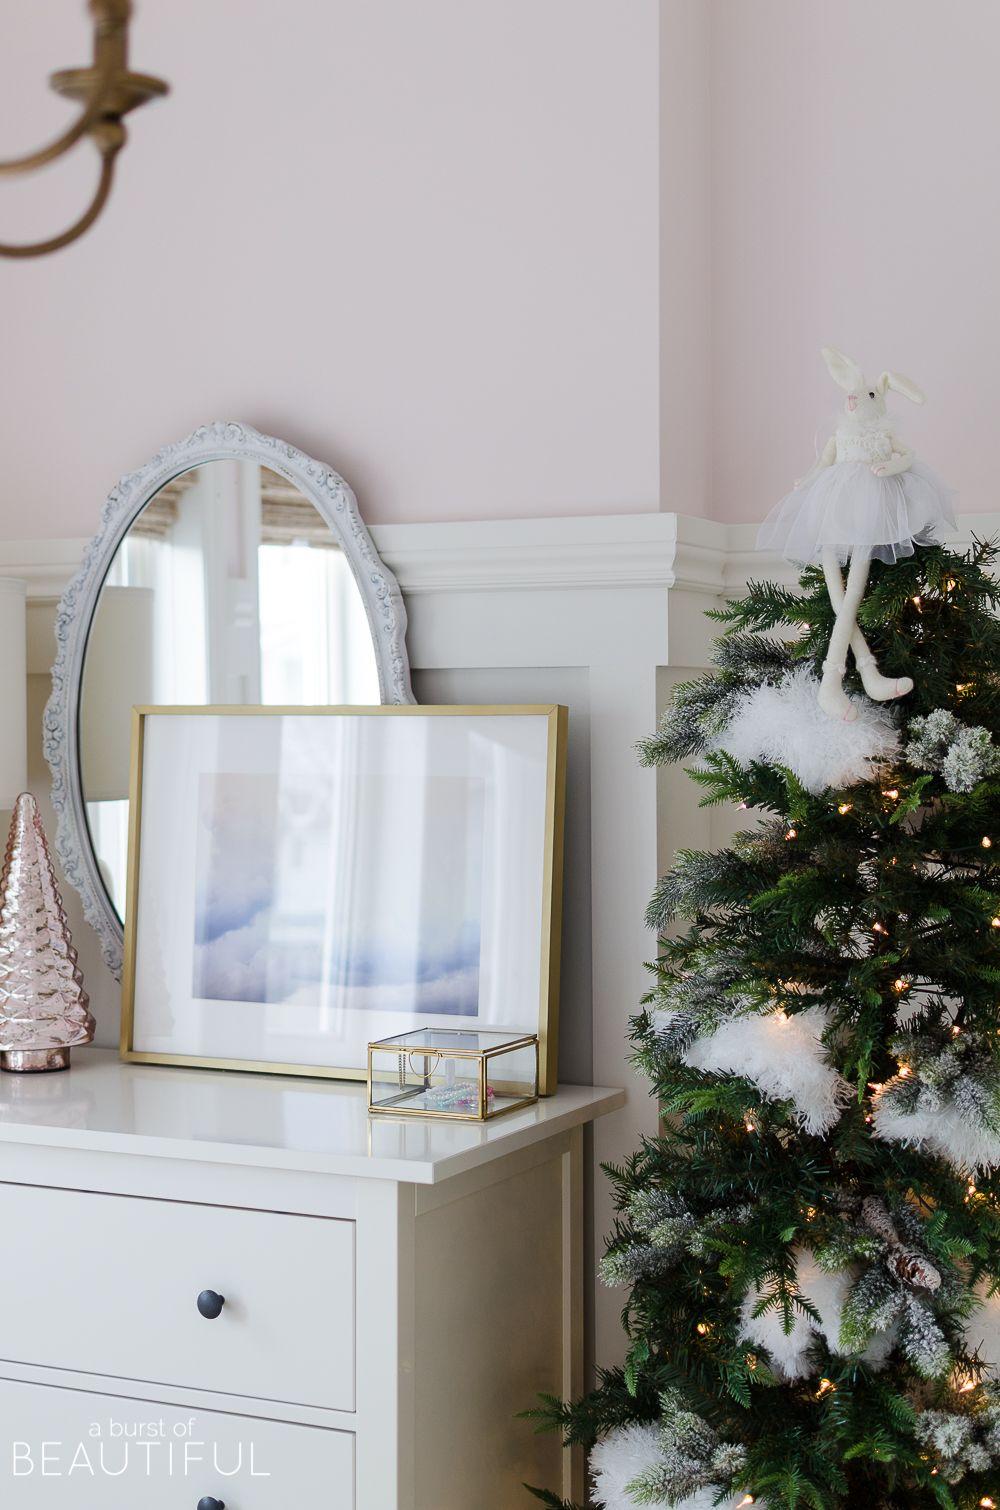 A Pink and White Christmas Bedroom | Christmas Home Tours ...